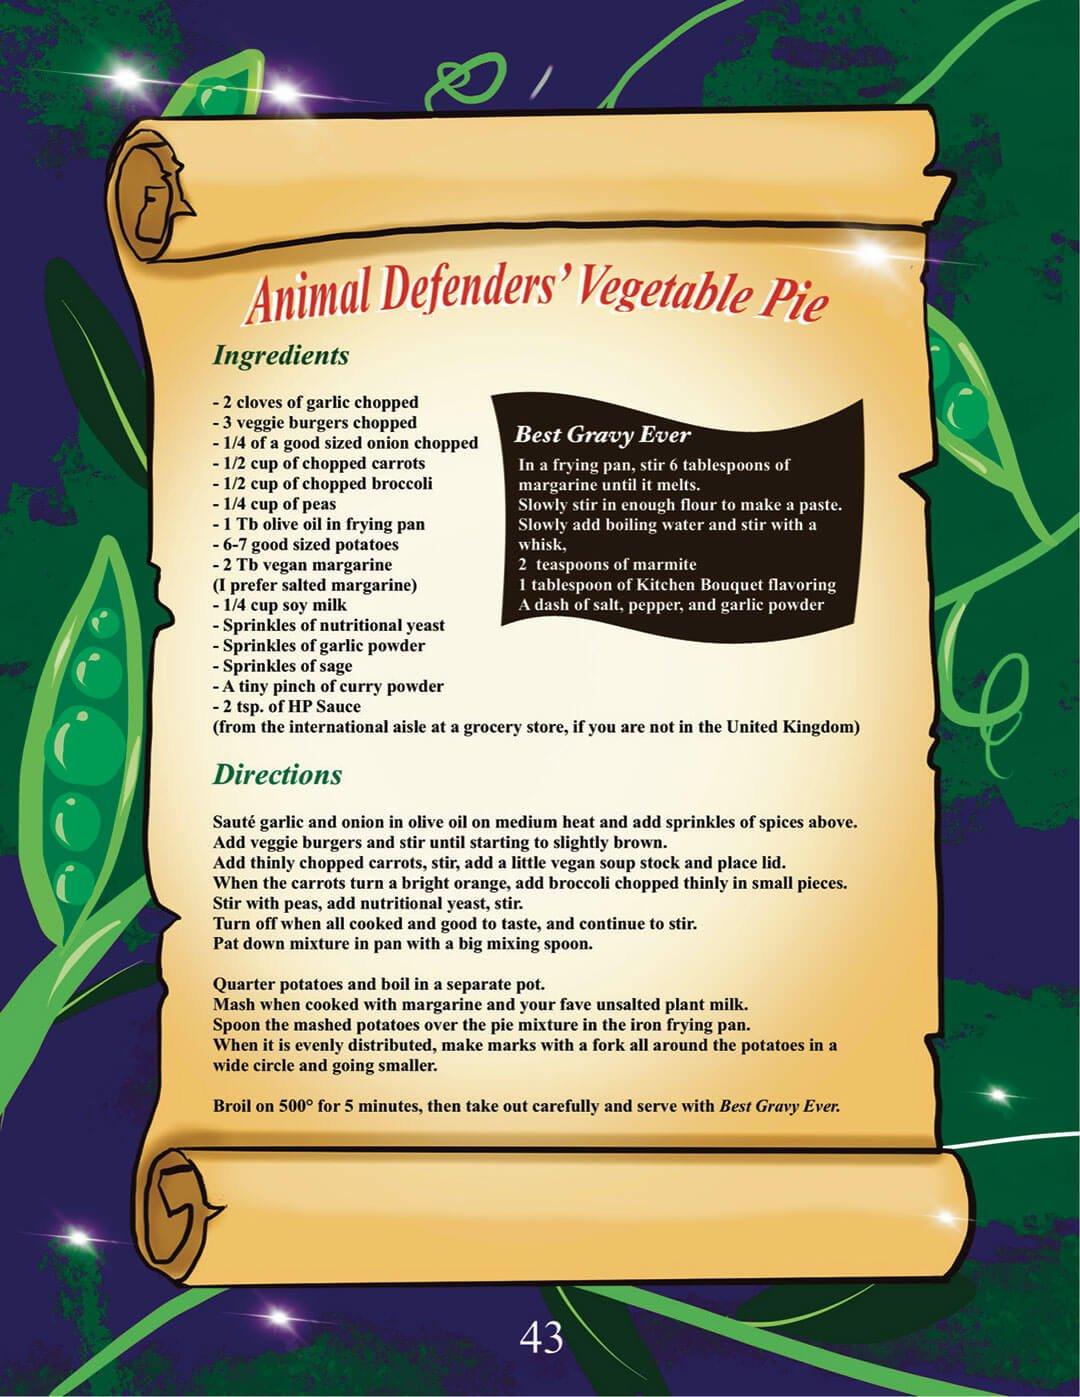 Image of recipe for Vegan vegetable pie